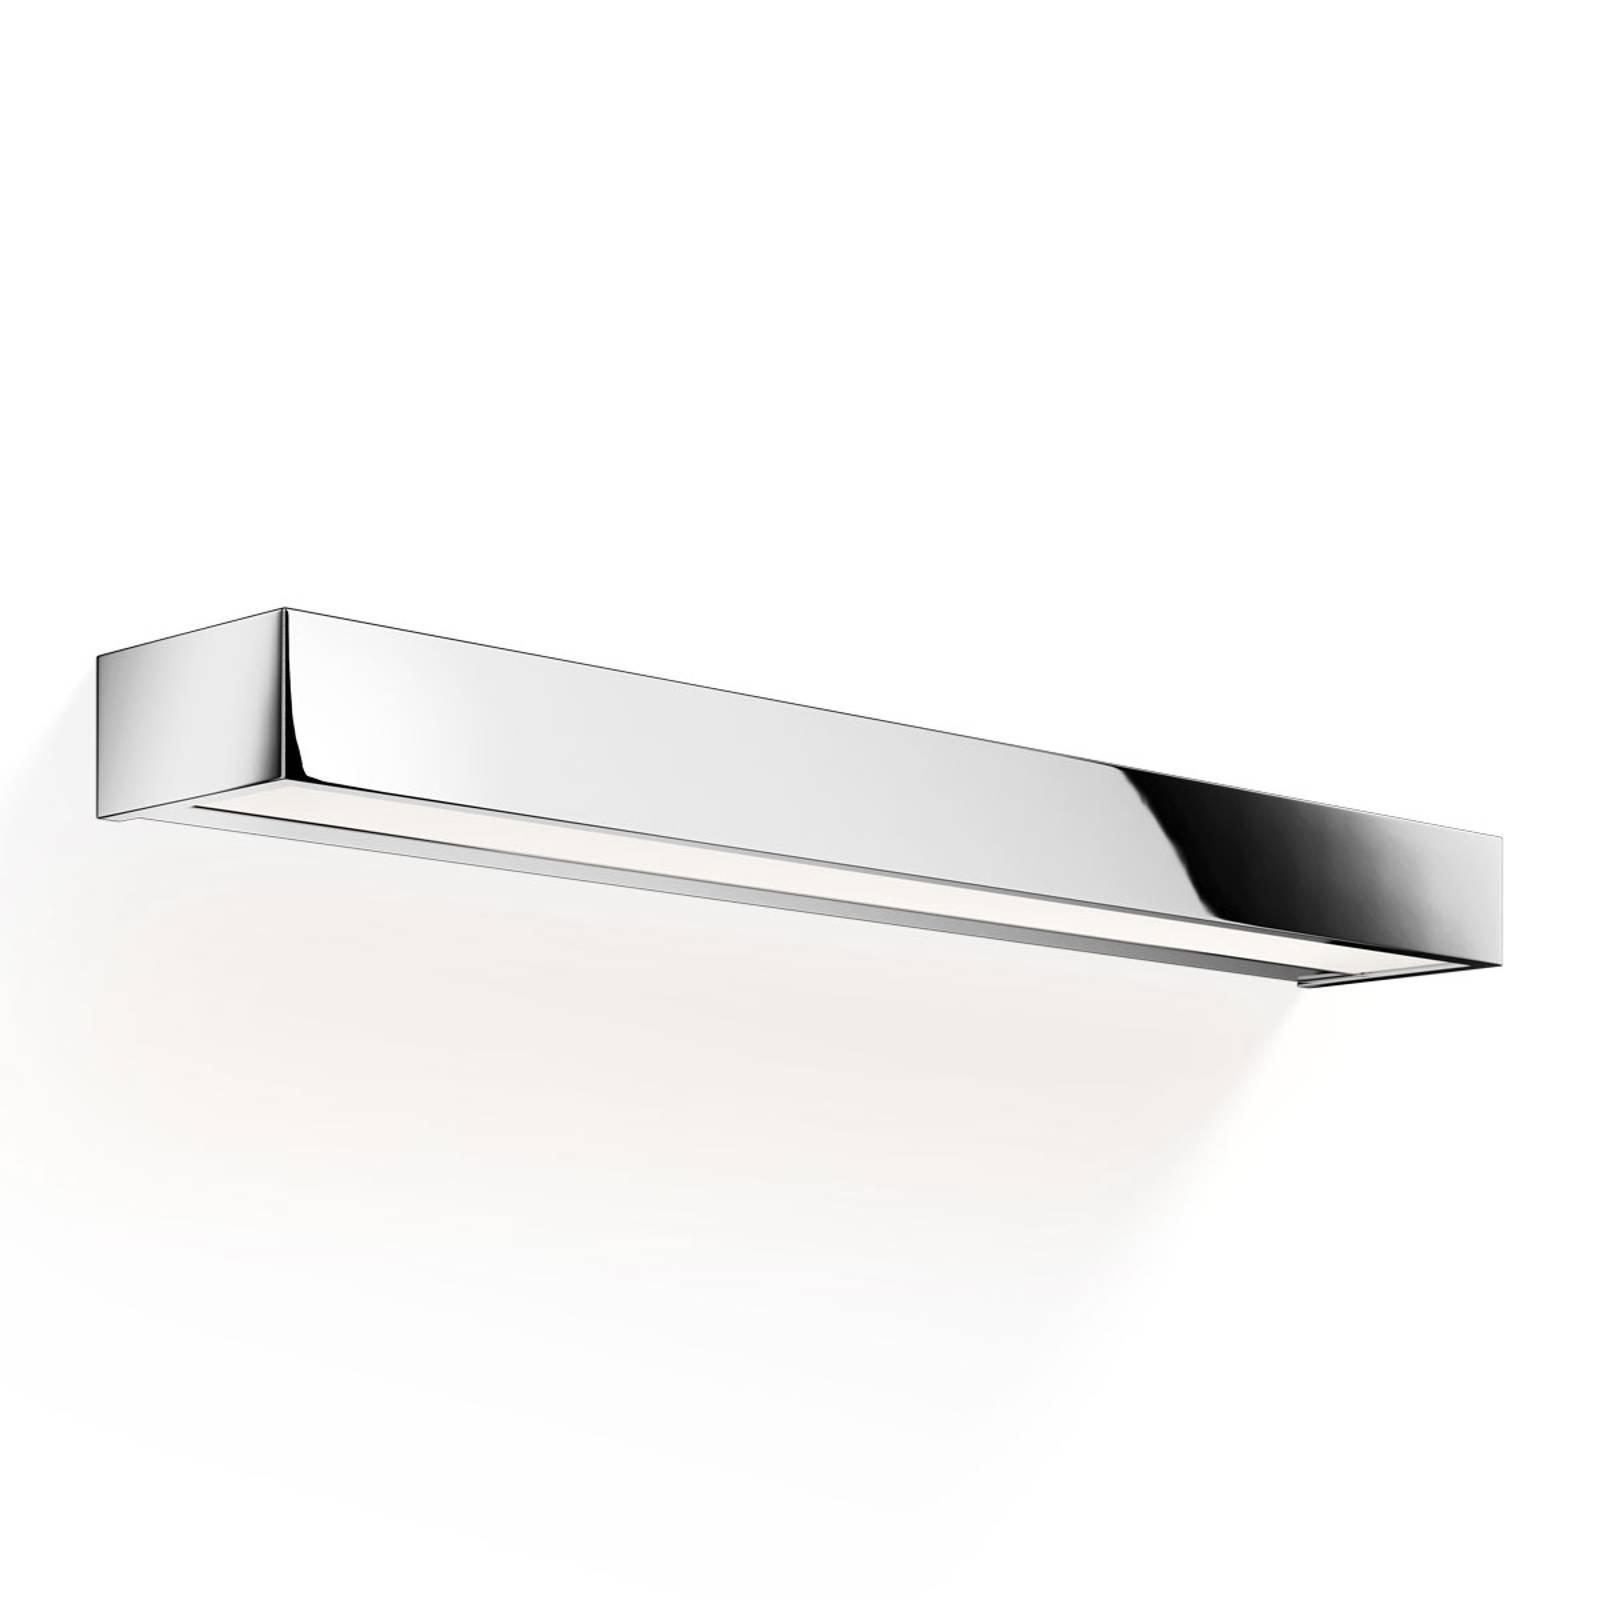 Decor Walther Box 60 N LED-vegglampe 2 700 K